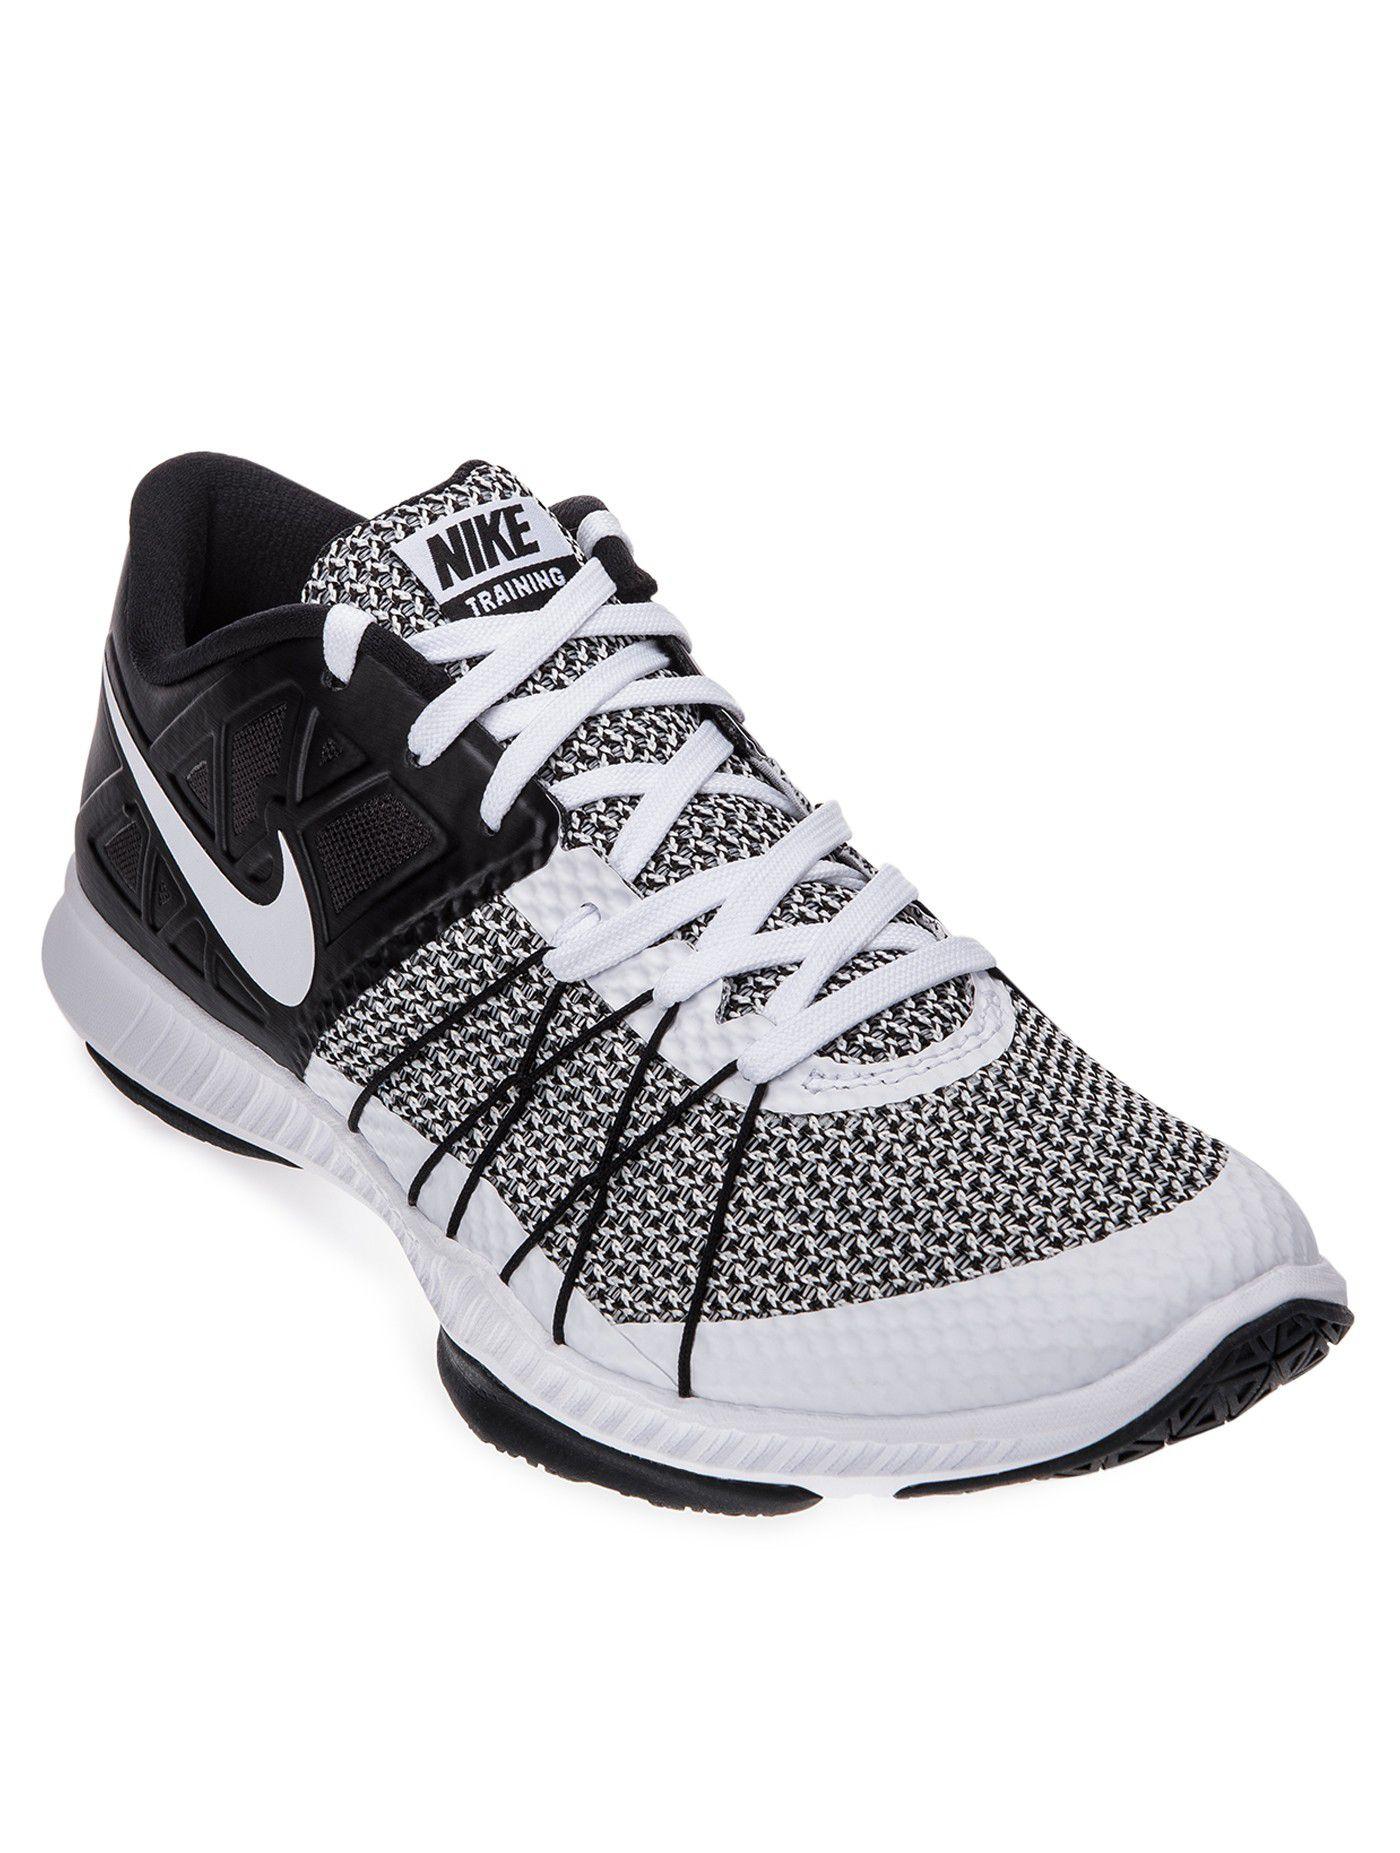 Tenis Nike Augmento - 844803-101